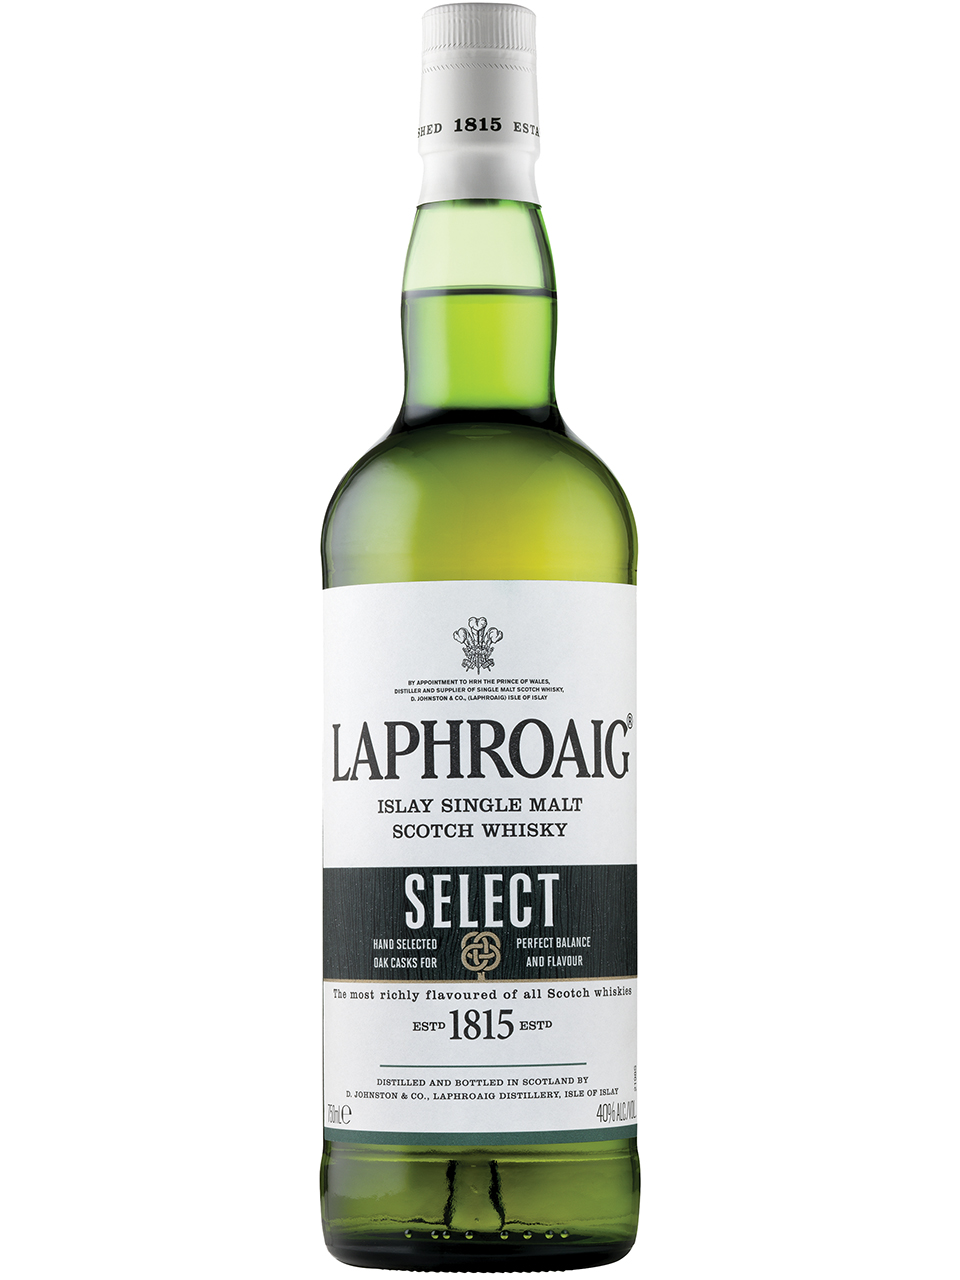 Laphroaig Select Scotch Whisky